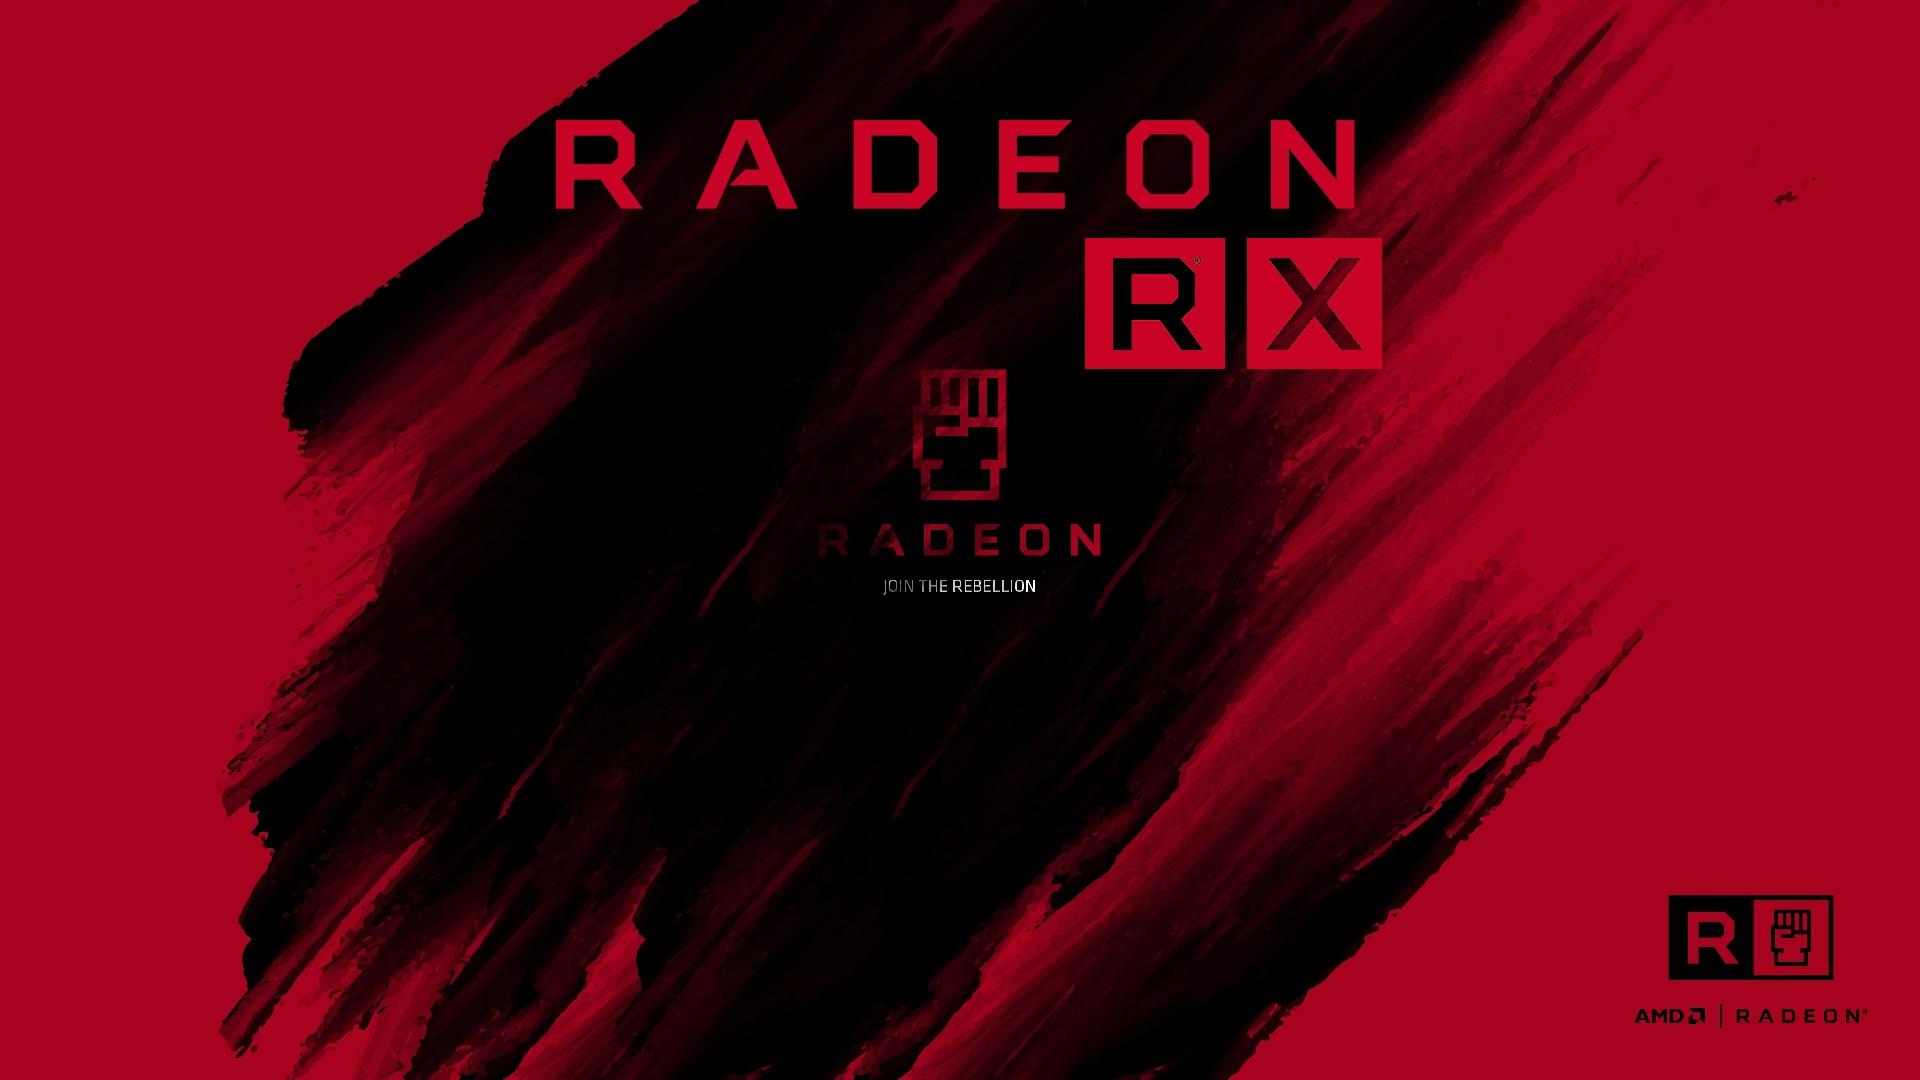 AMD Radeon RX 580, Radeon RX 570 and Radeon RX 550 Performance